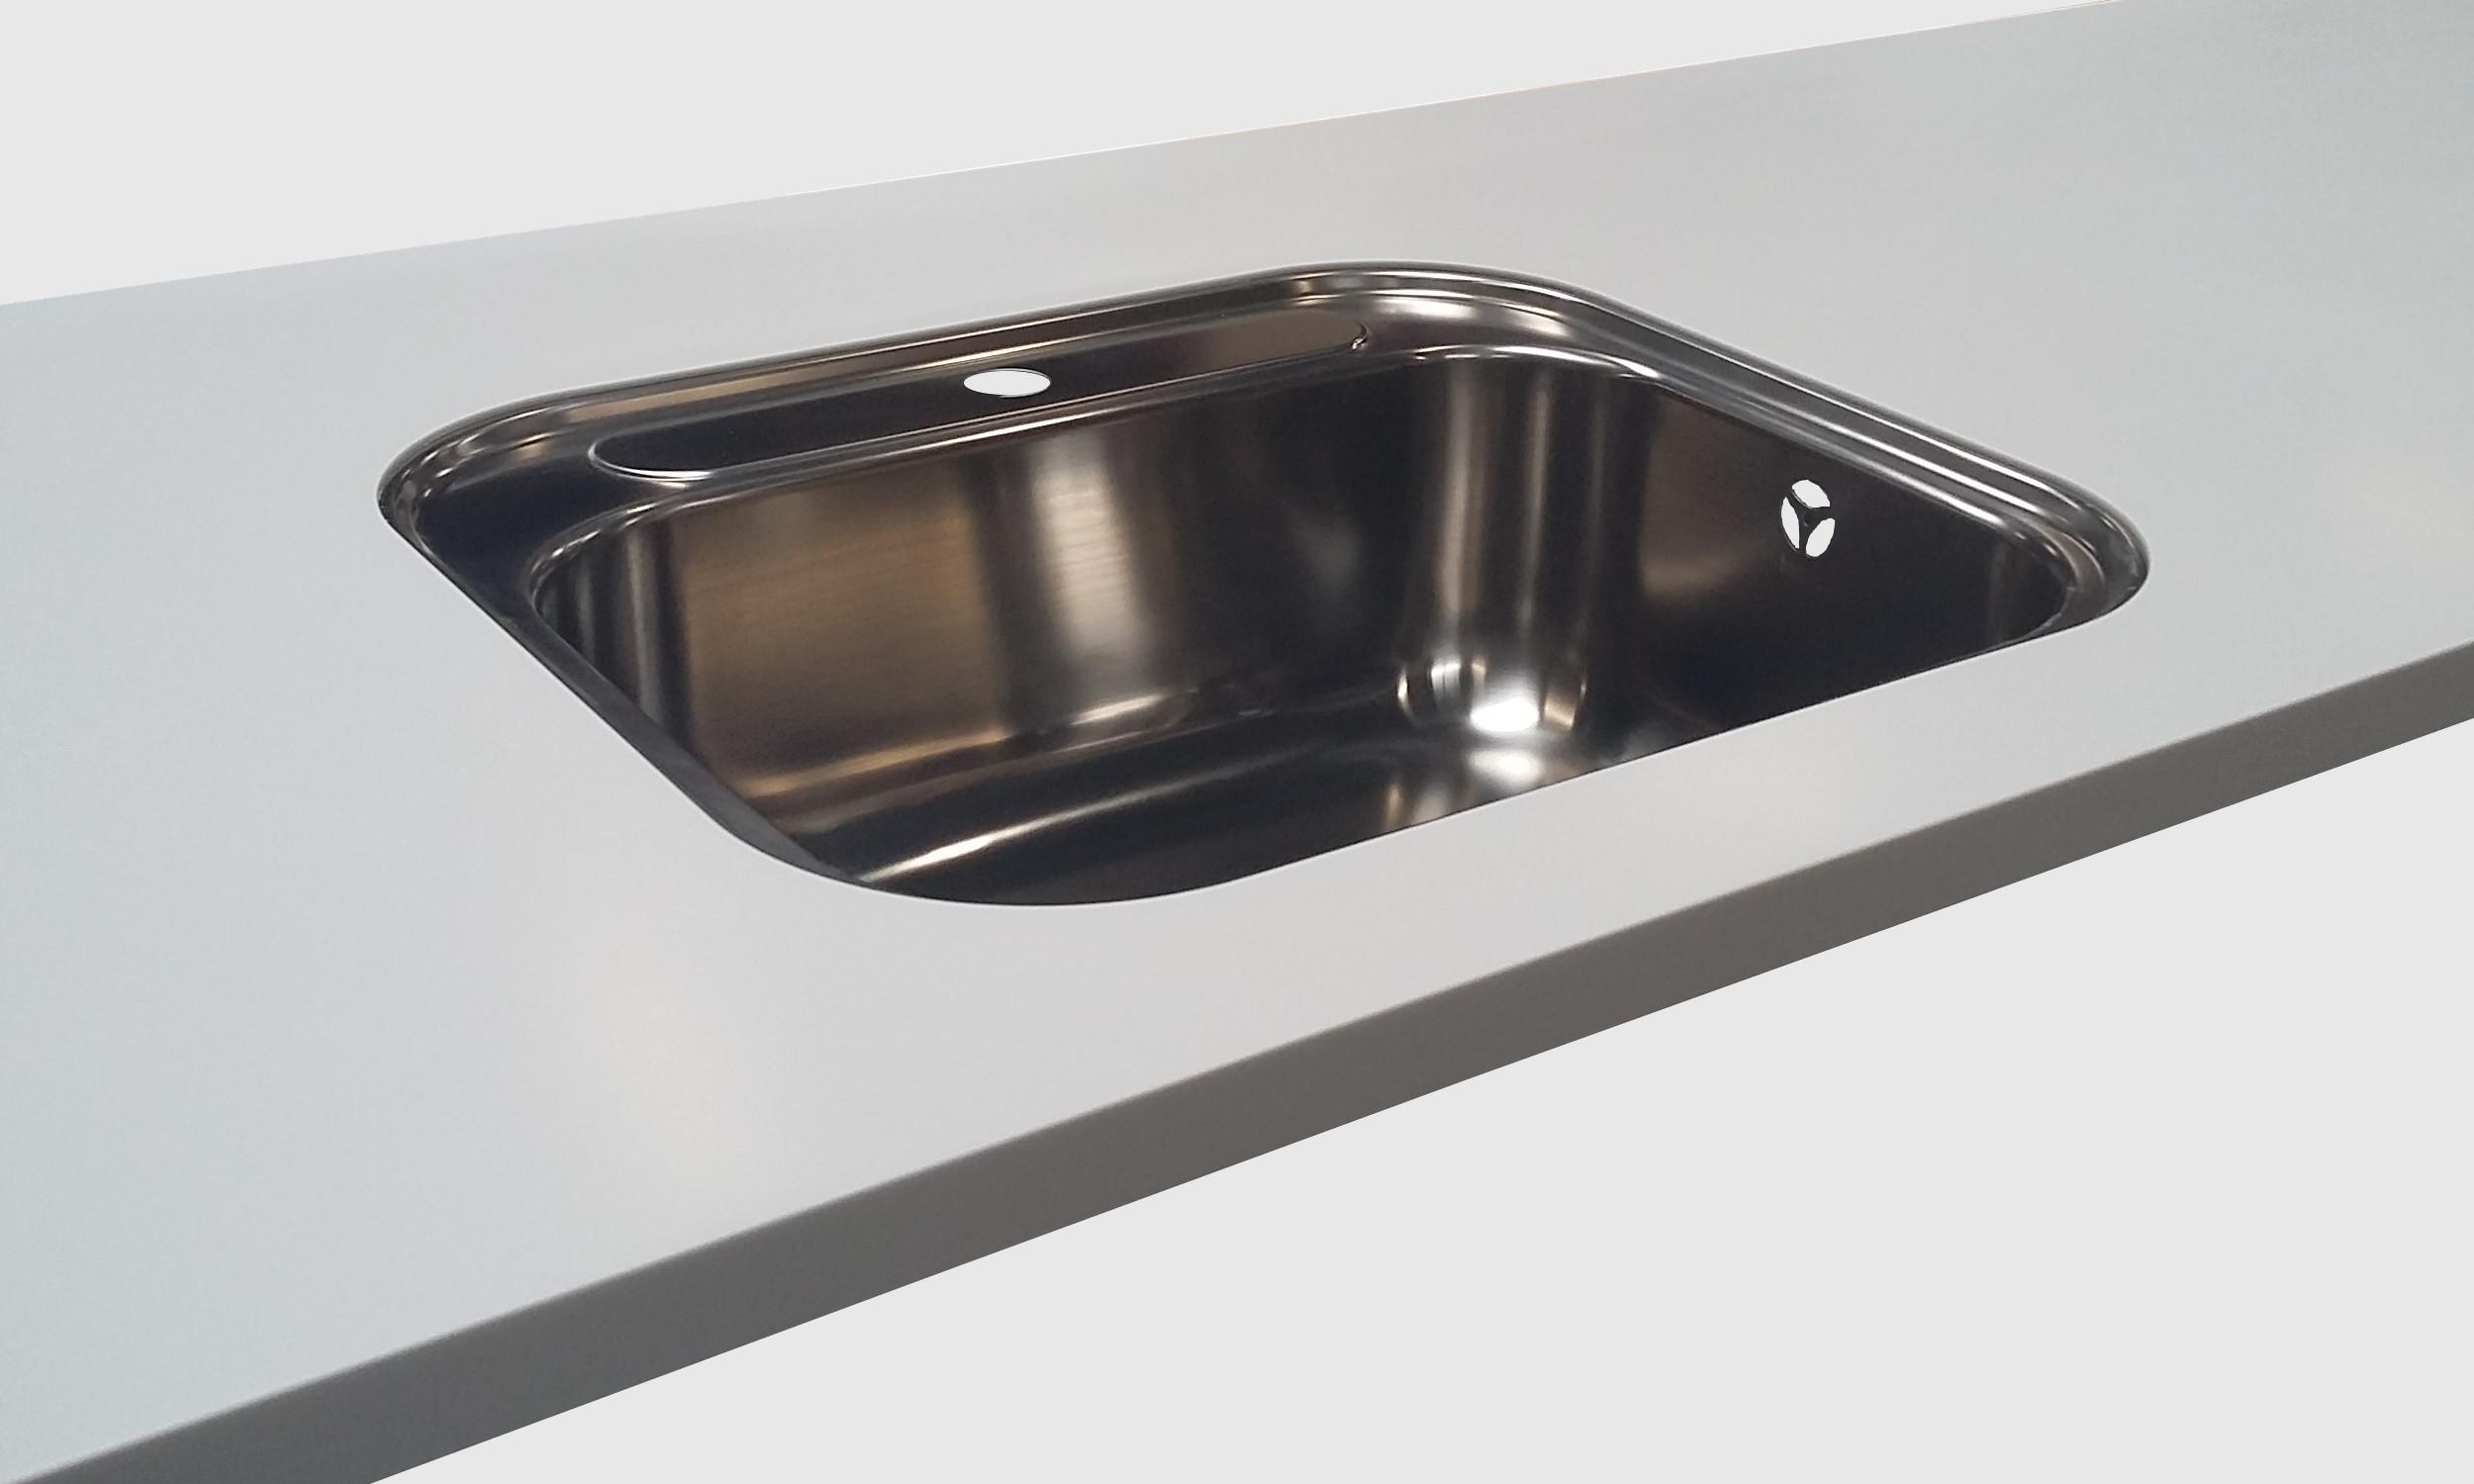 Stålvask med bagkant underlimet i 30 mm. Dupont Corian bordplade.